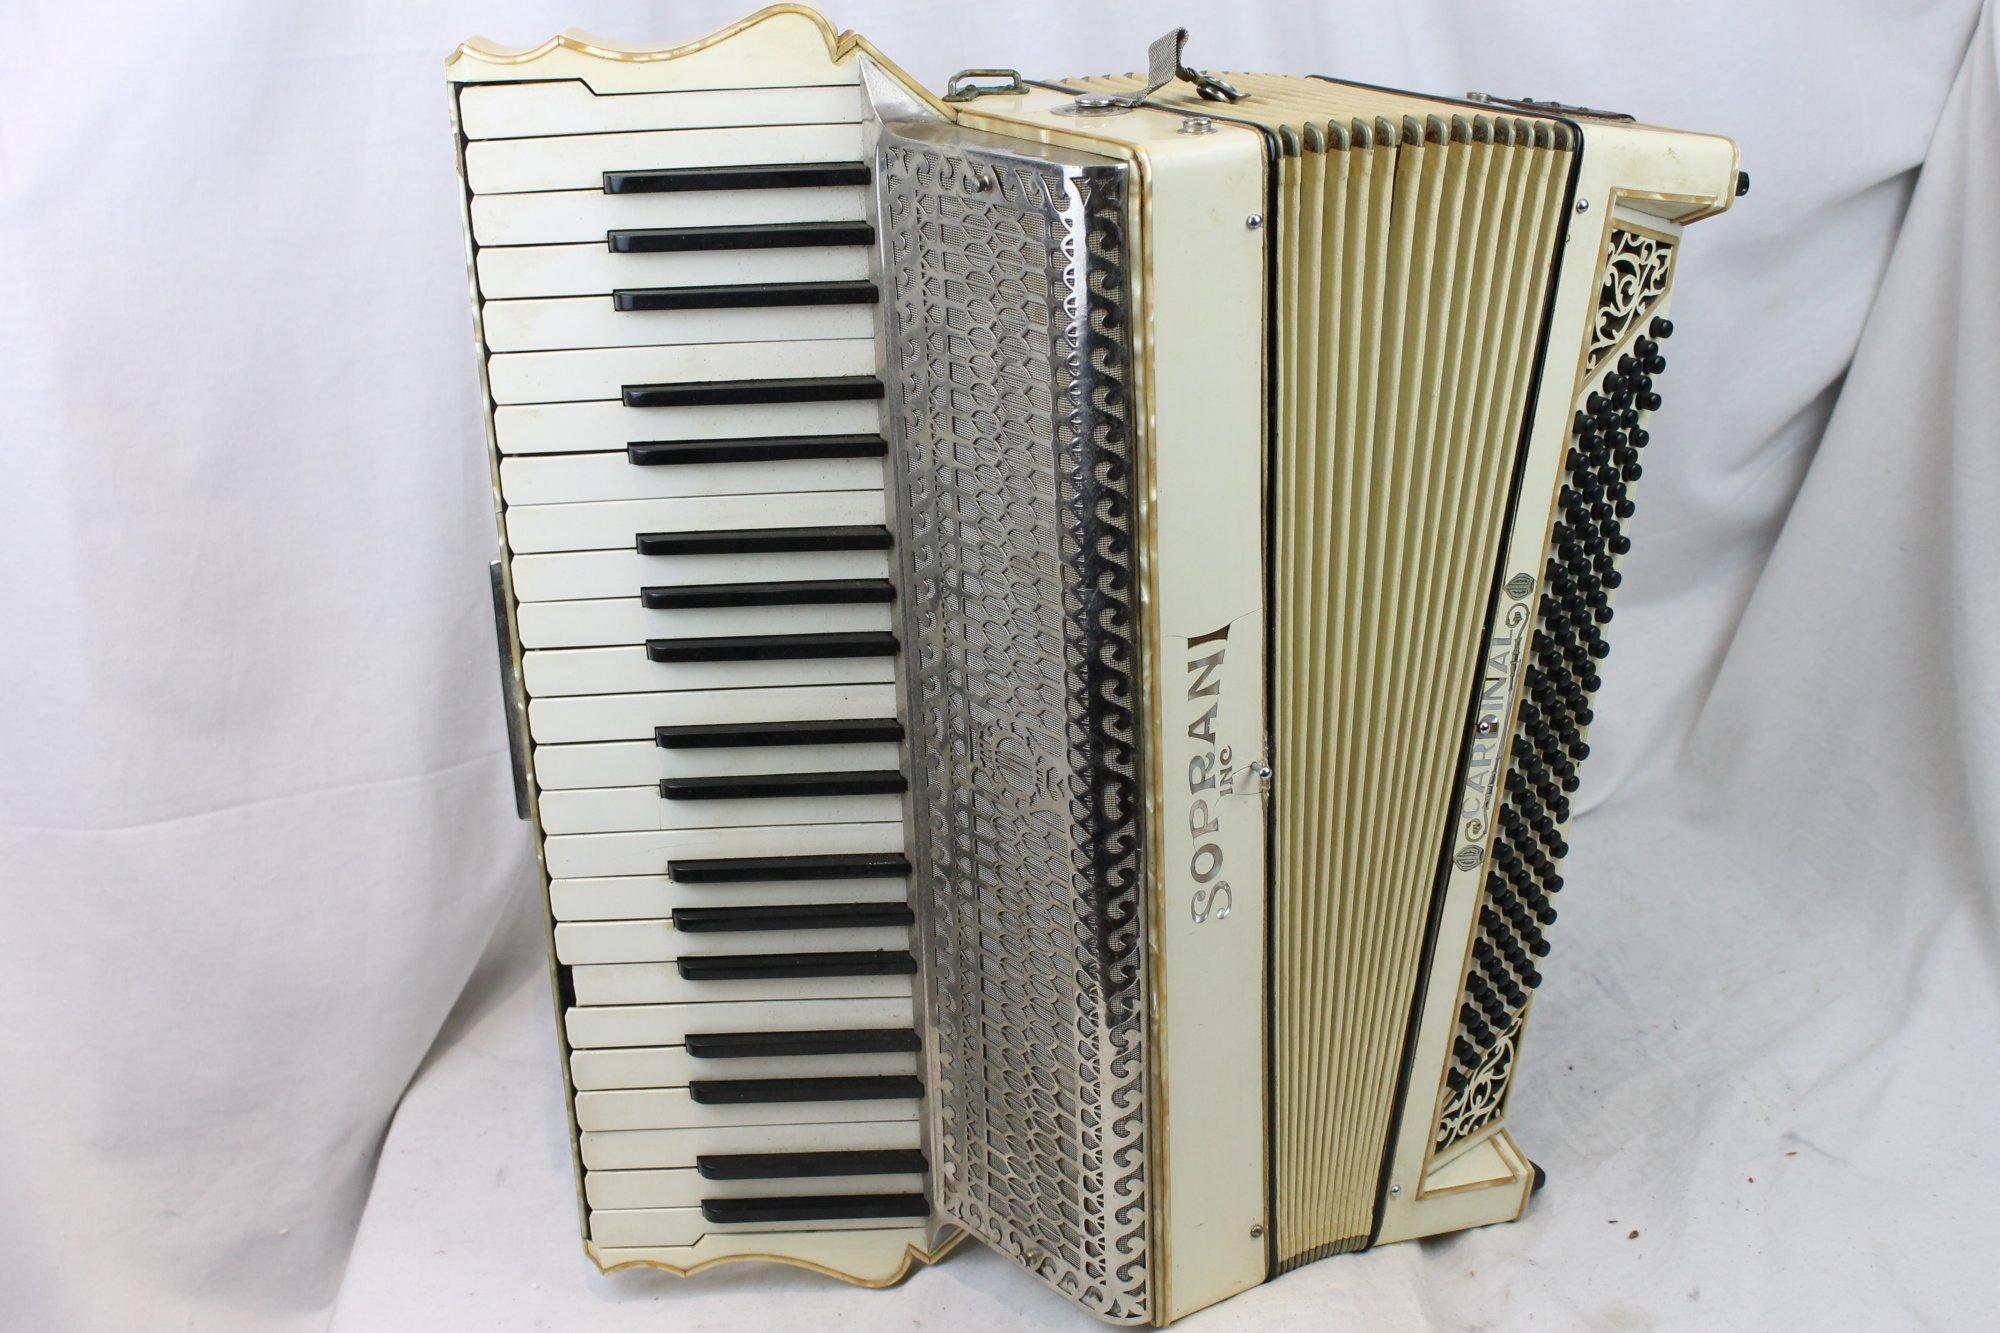 3286 - Cream Soprani Cardinal Piano Accordion LMM 42 120 - For Parts or Repair